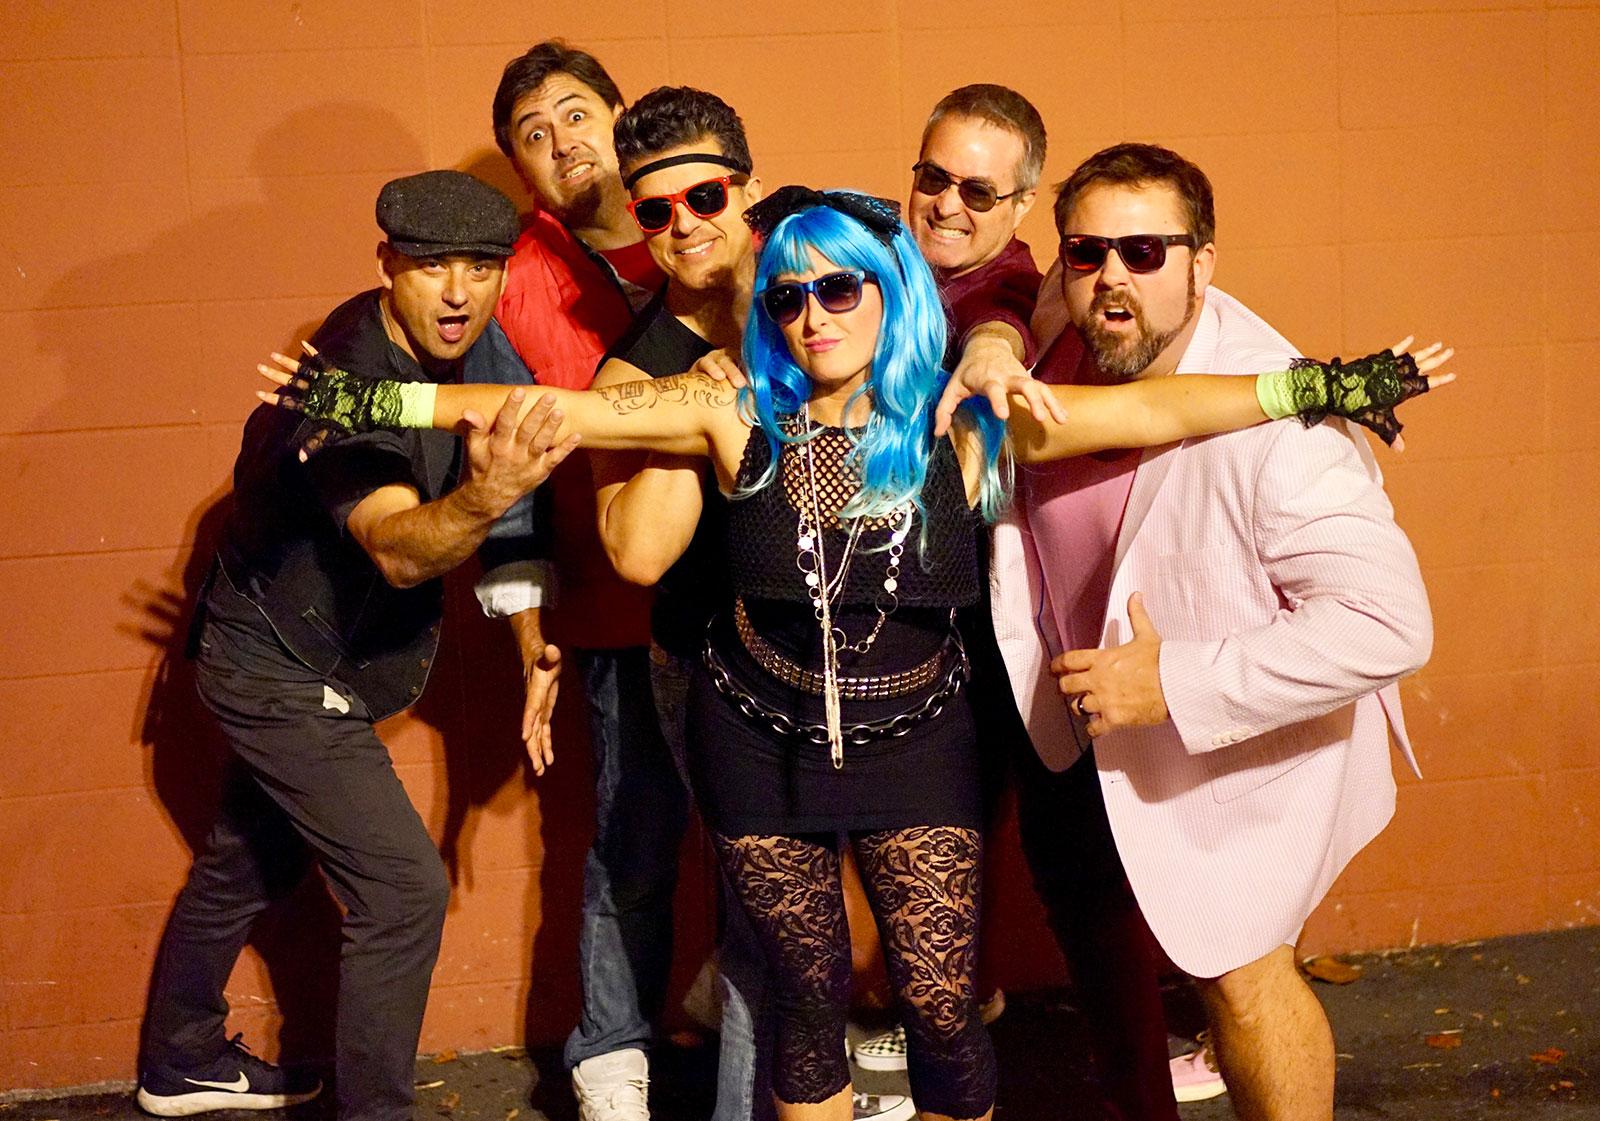 main-band-promo-photo.jpg